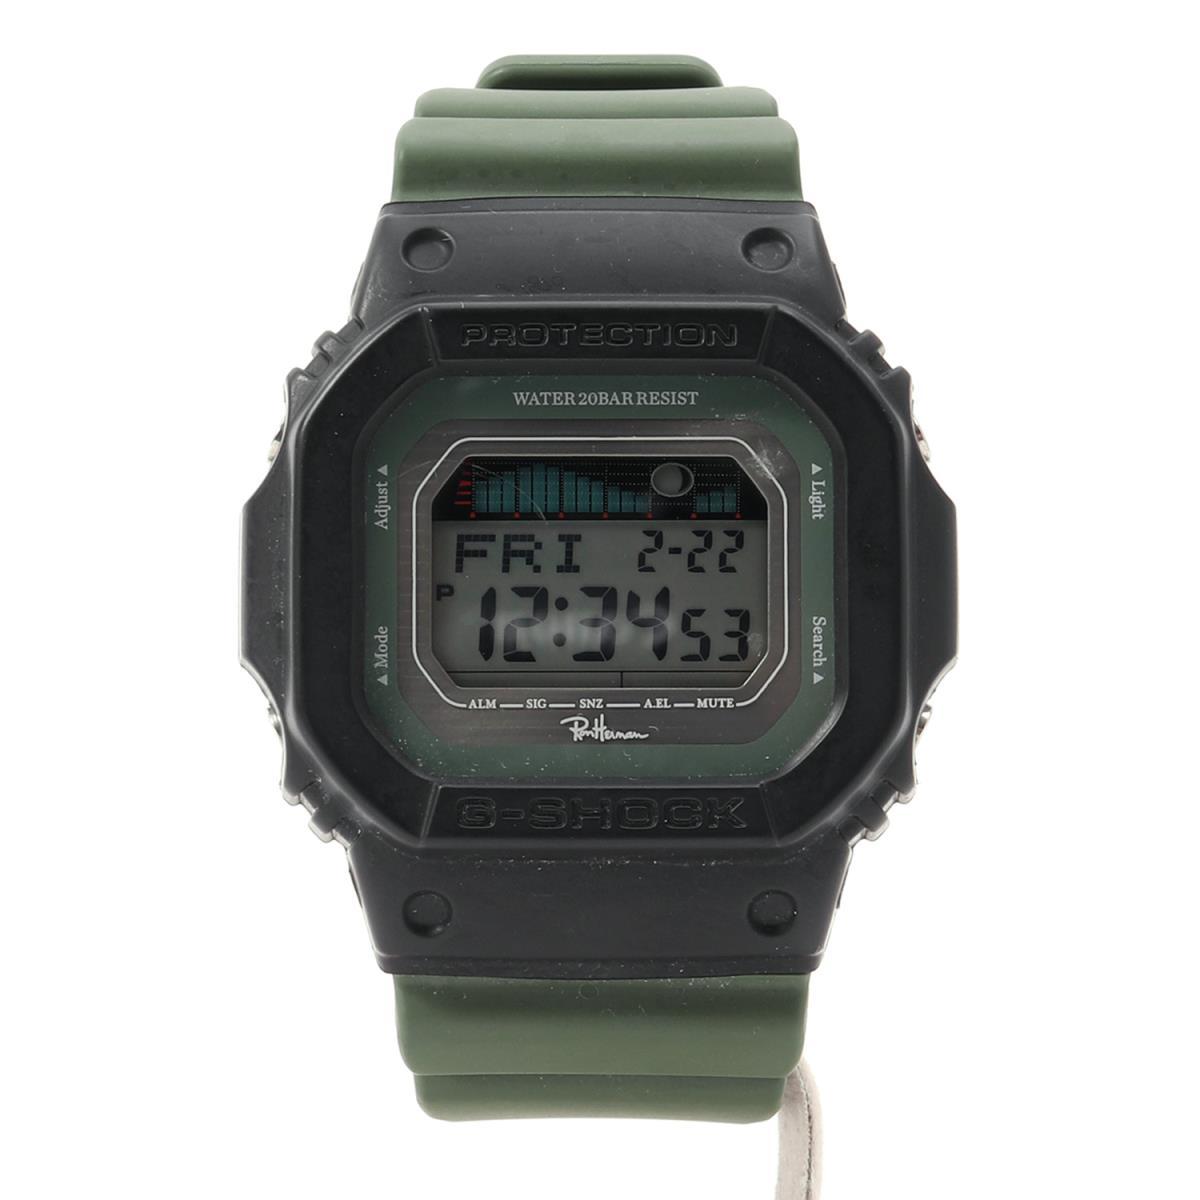 Ron Herman (ロンハーマン) 17S/S ×CASIO G‐SHOCK(GLX-5600RH-3J) 腕時計 ウォッチ ブラック×カーキ 【メンズ】【K2212】【中古】【あす楽☆対応可】